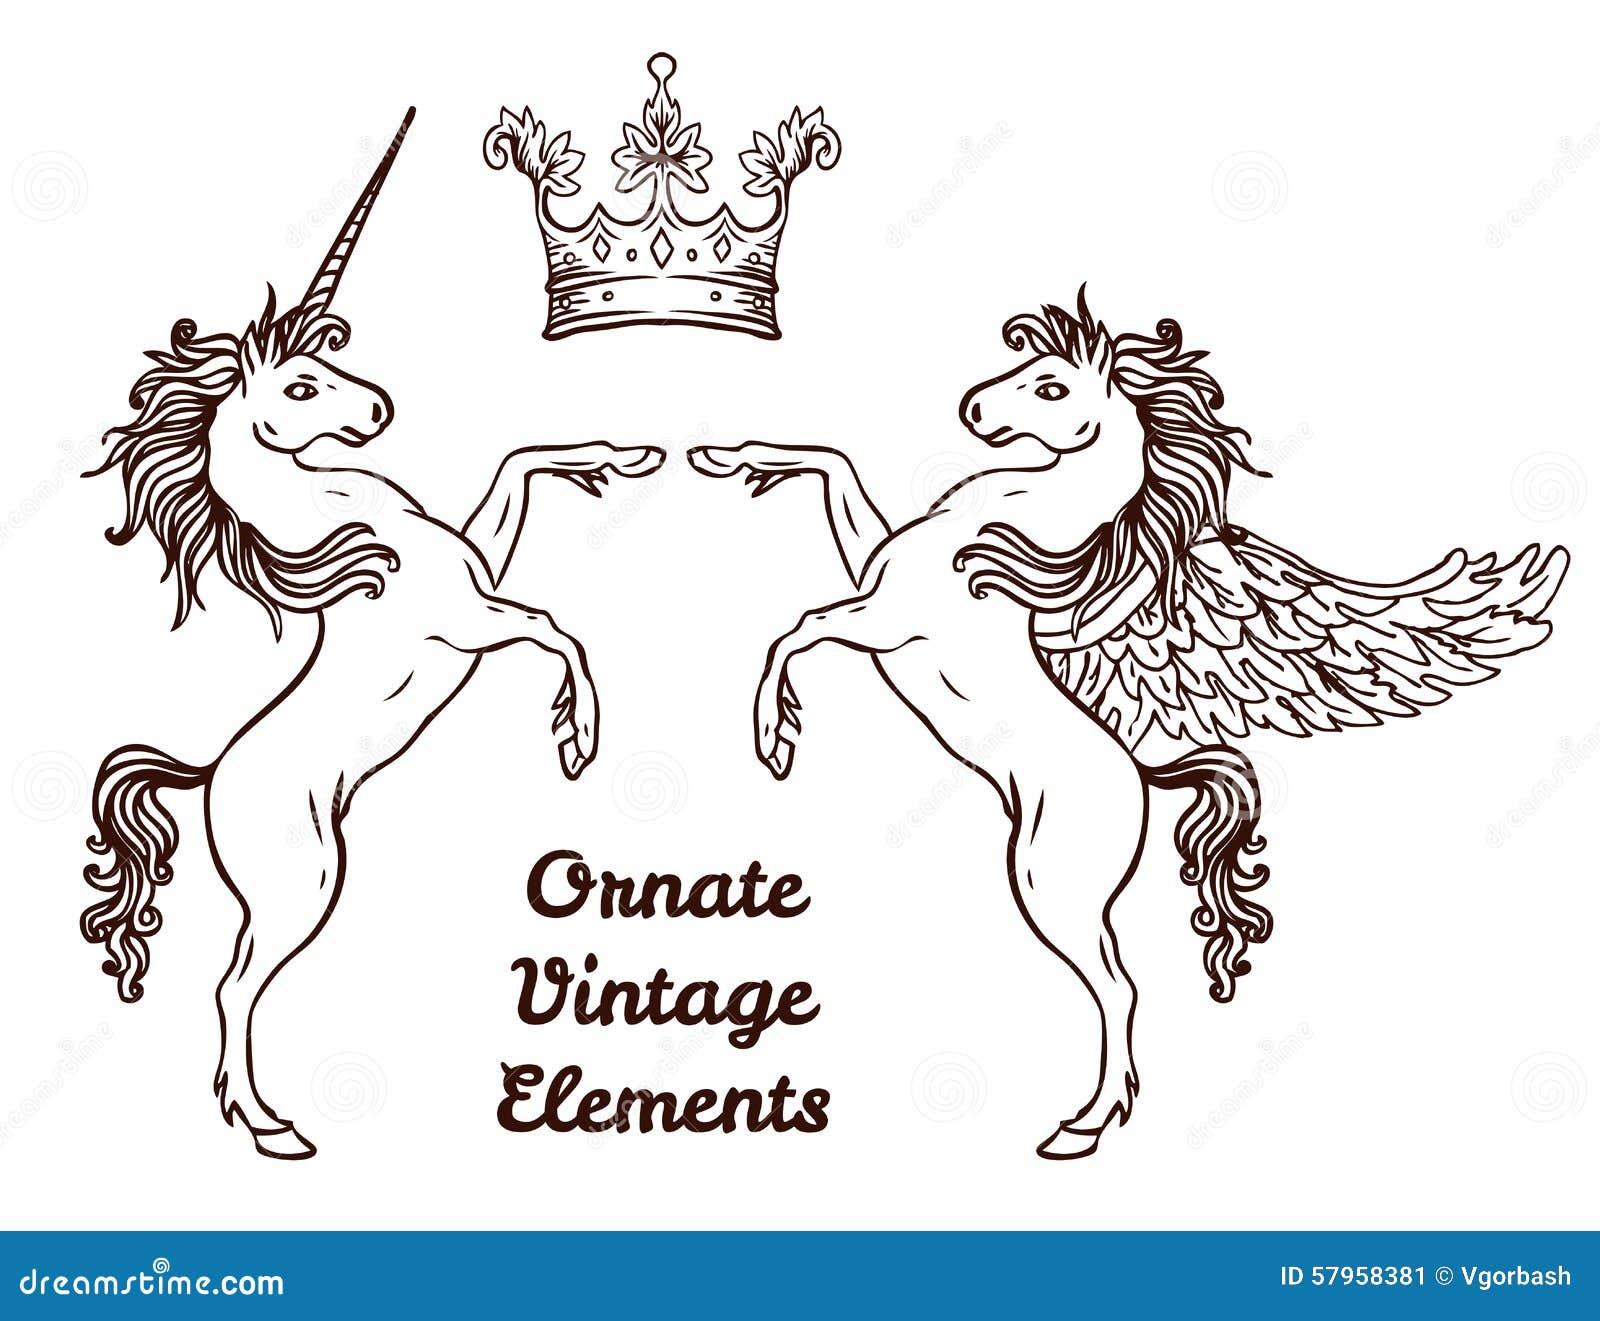 crest with vintage style design elements use for logo frame